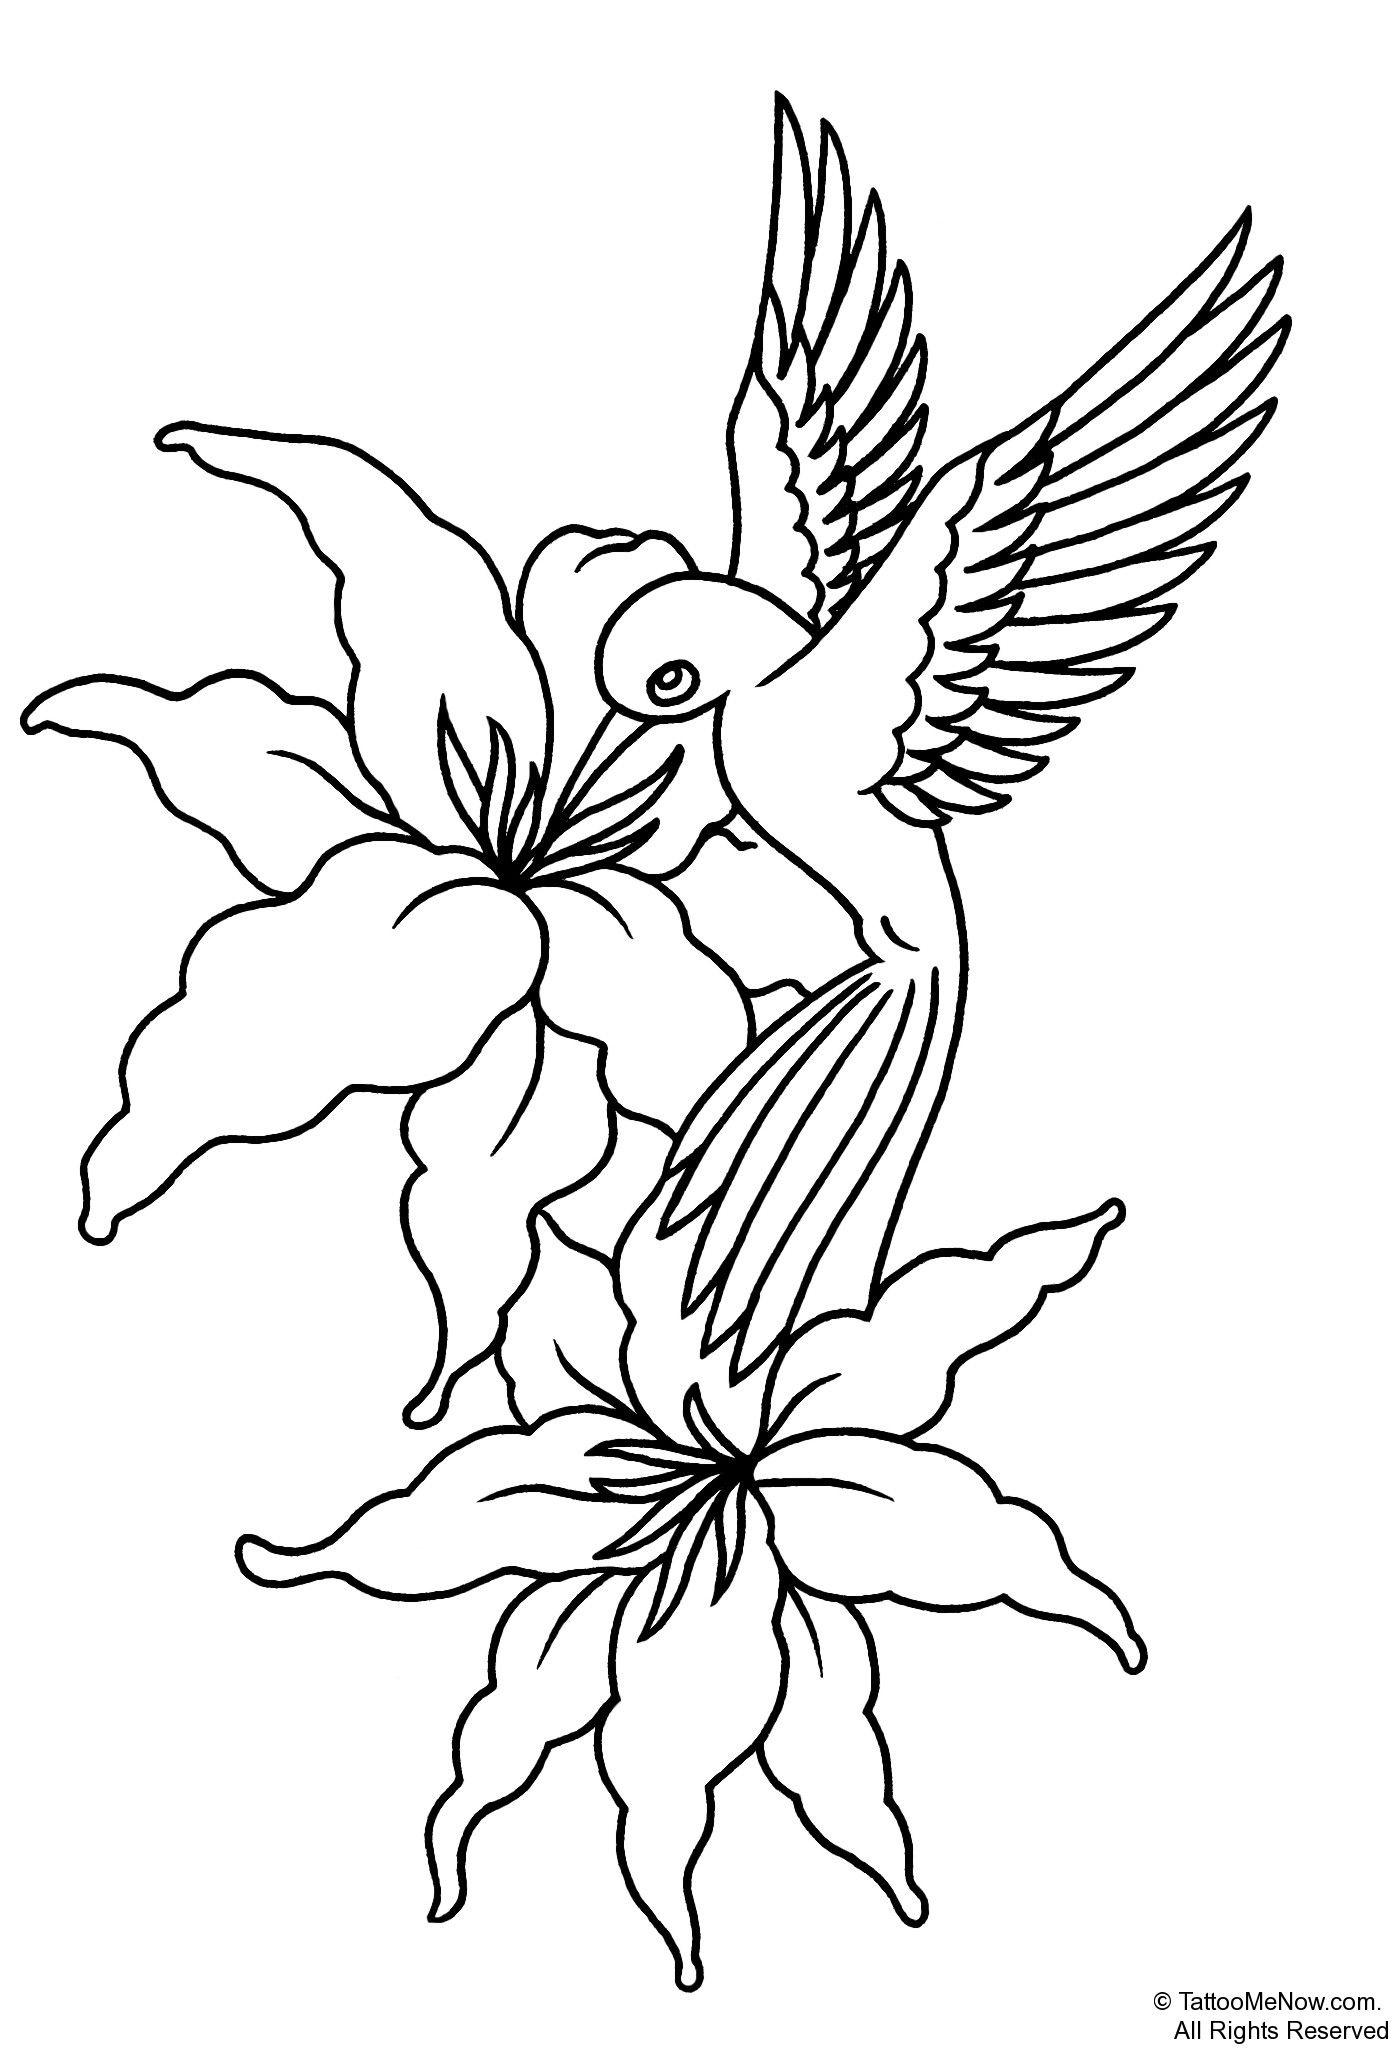 Free Printable Tattoo Stencils   Your Free Tattoo Designs & Stencils - Free Tattoo Stencils Printable